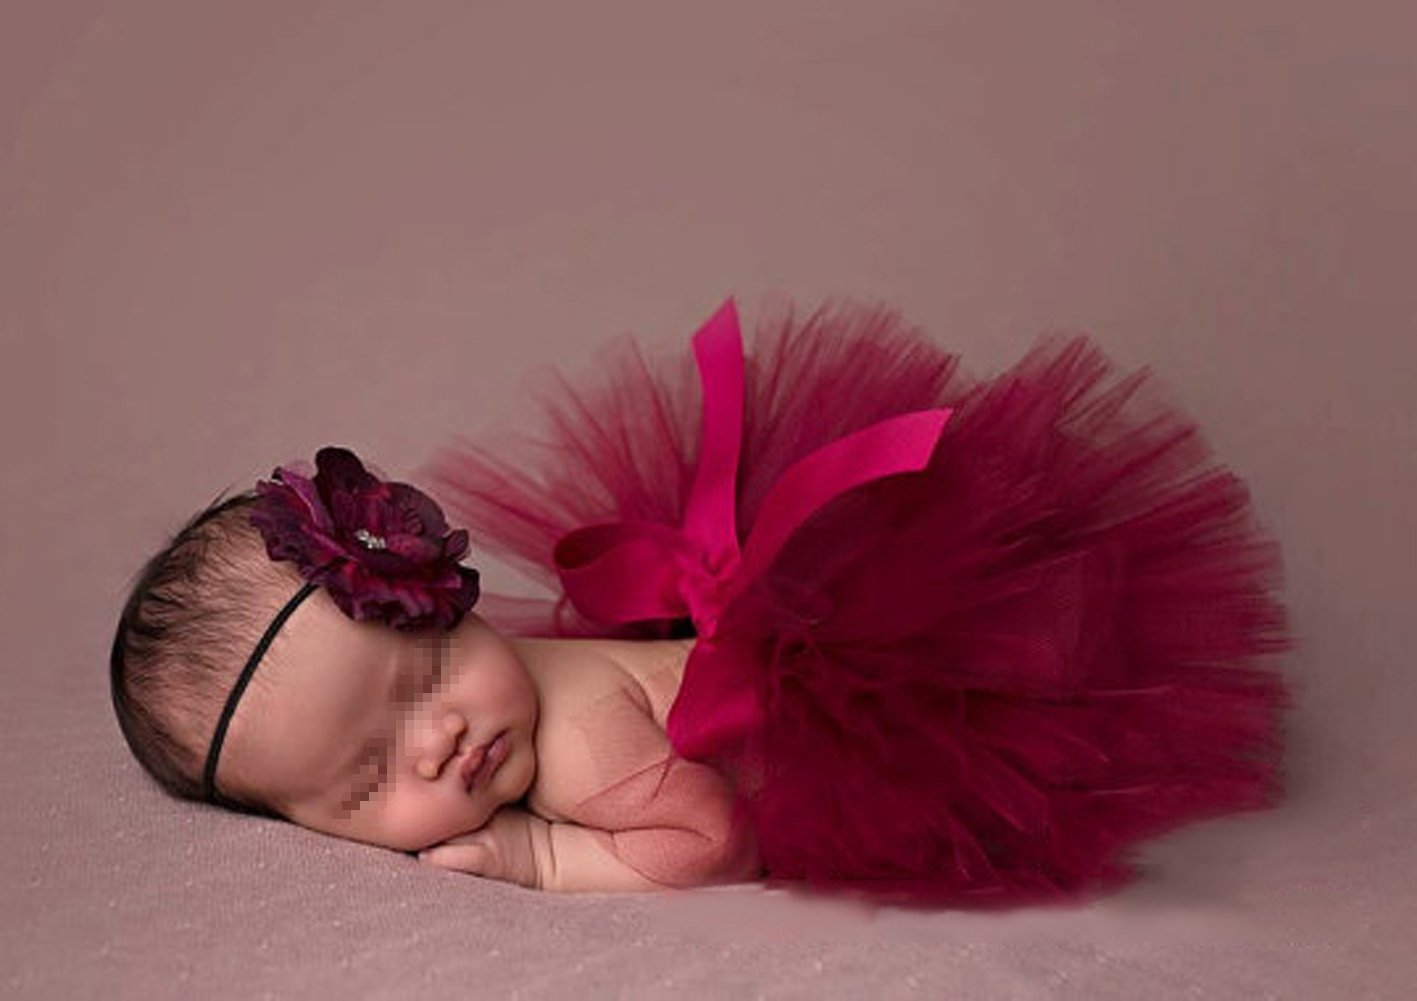 ZUMUii butterem Reci/¨/¦n Nacido Baby s?ugling fotograf/¨/ªa Tija Flores Tutu Rock Disfraz Ropa Ropa Cinta Set